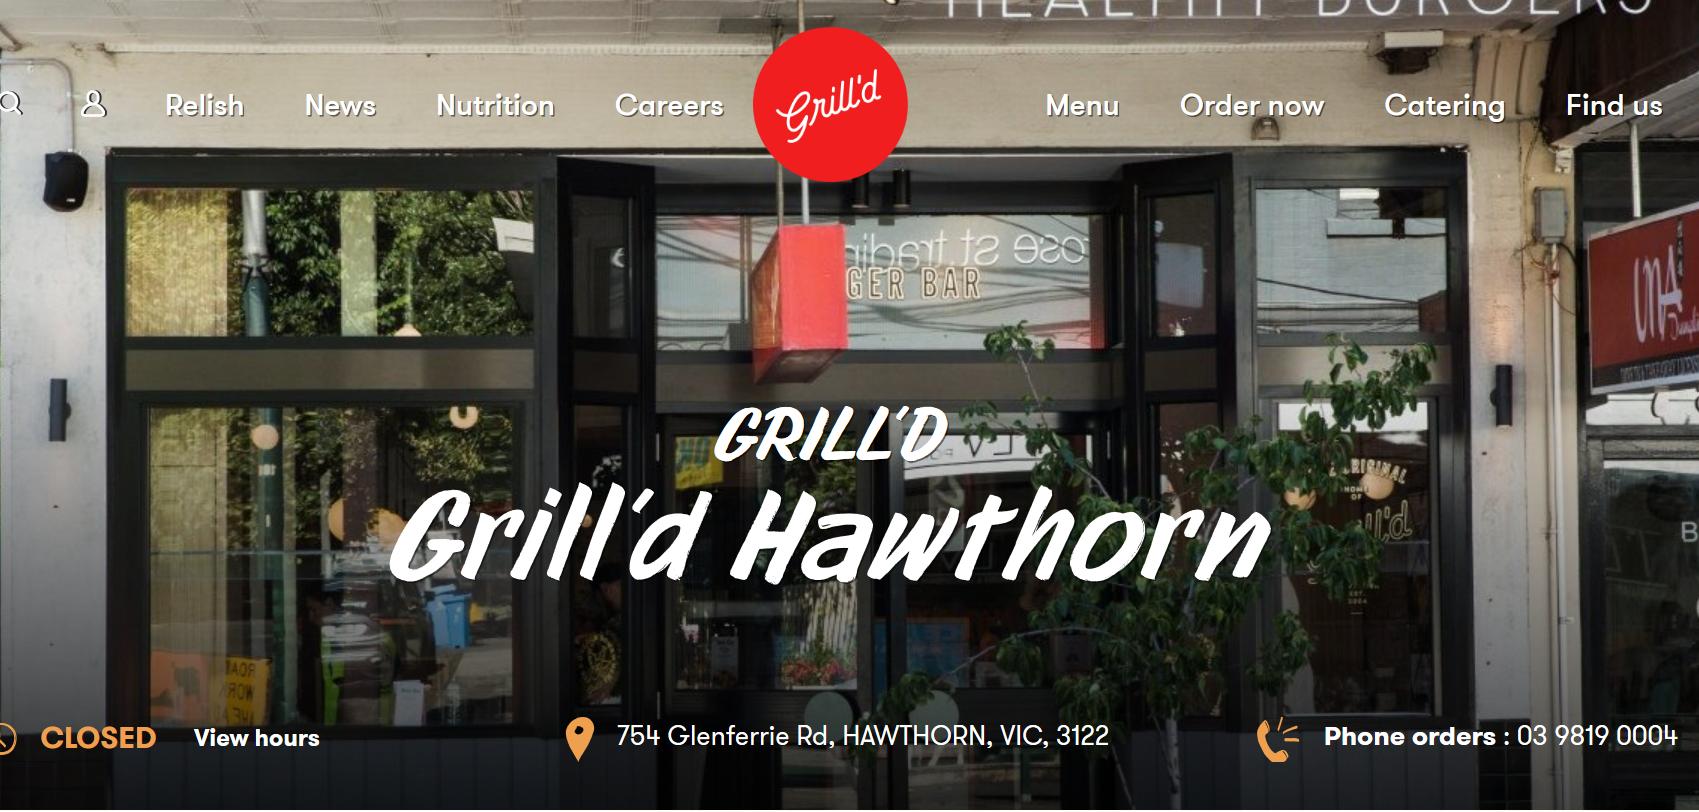 Grill'd Hawthorn